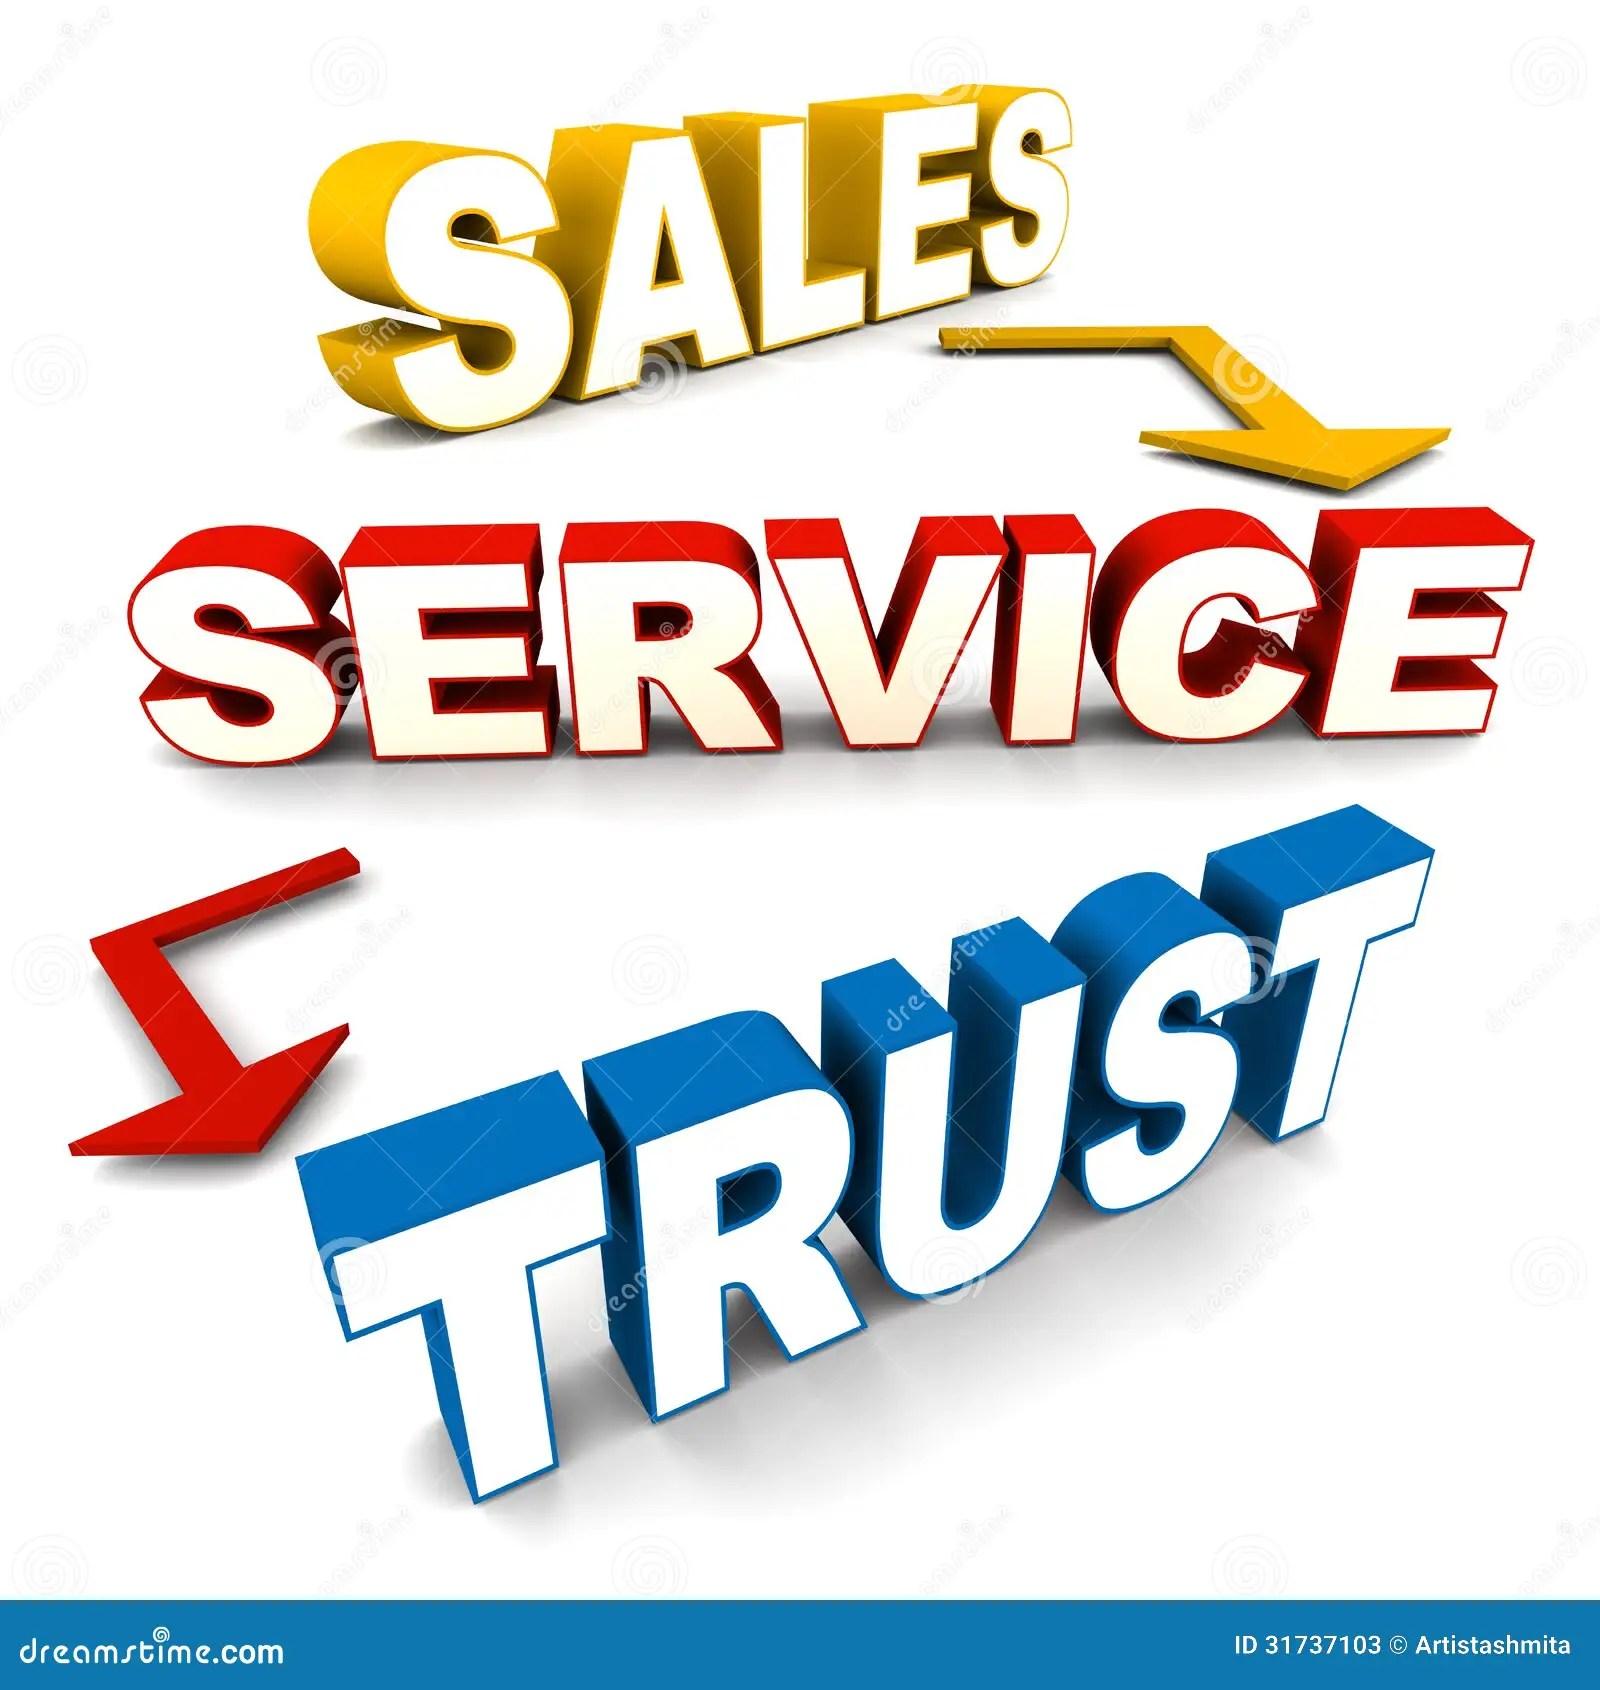 Sales Service Trust Stock Photos  Image 31737103